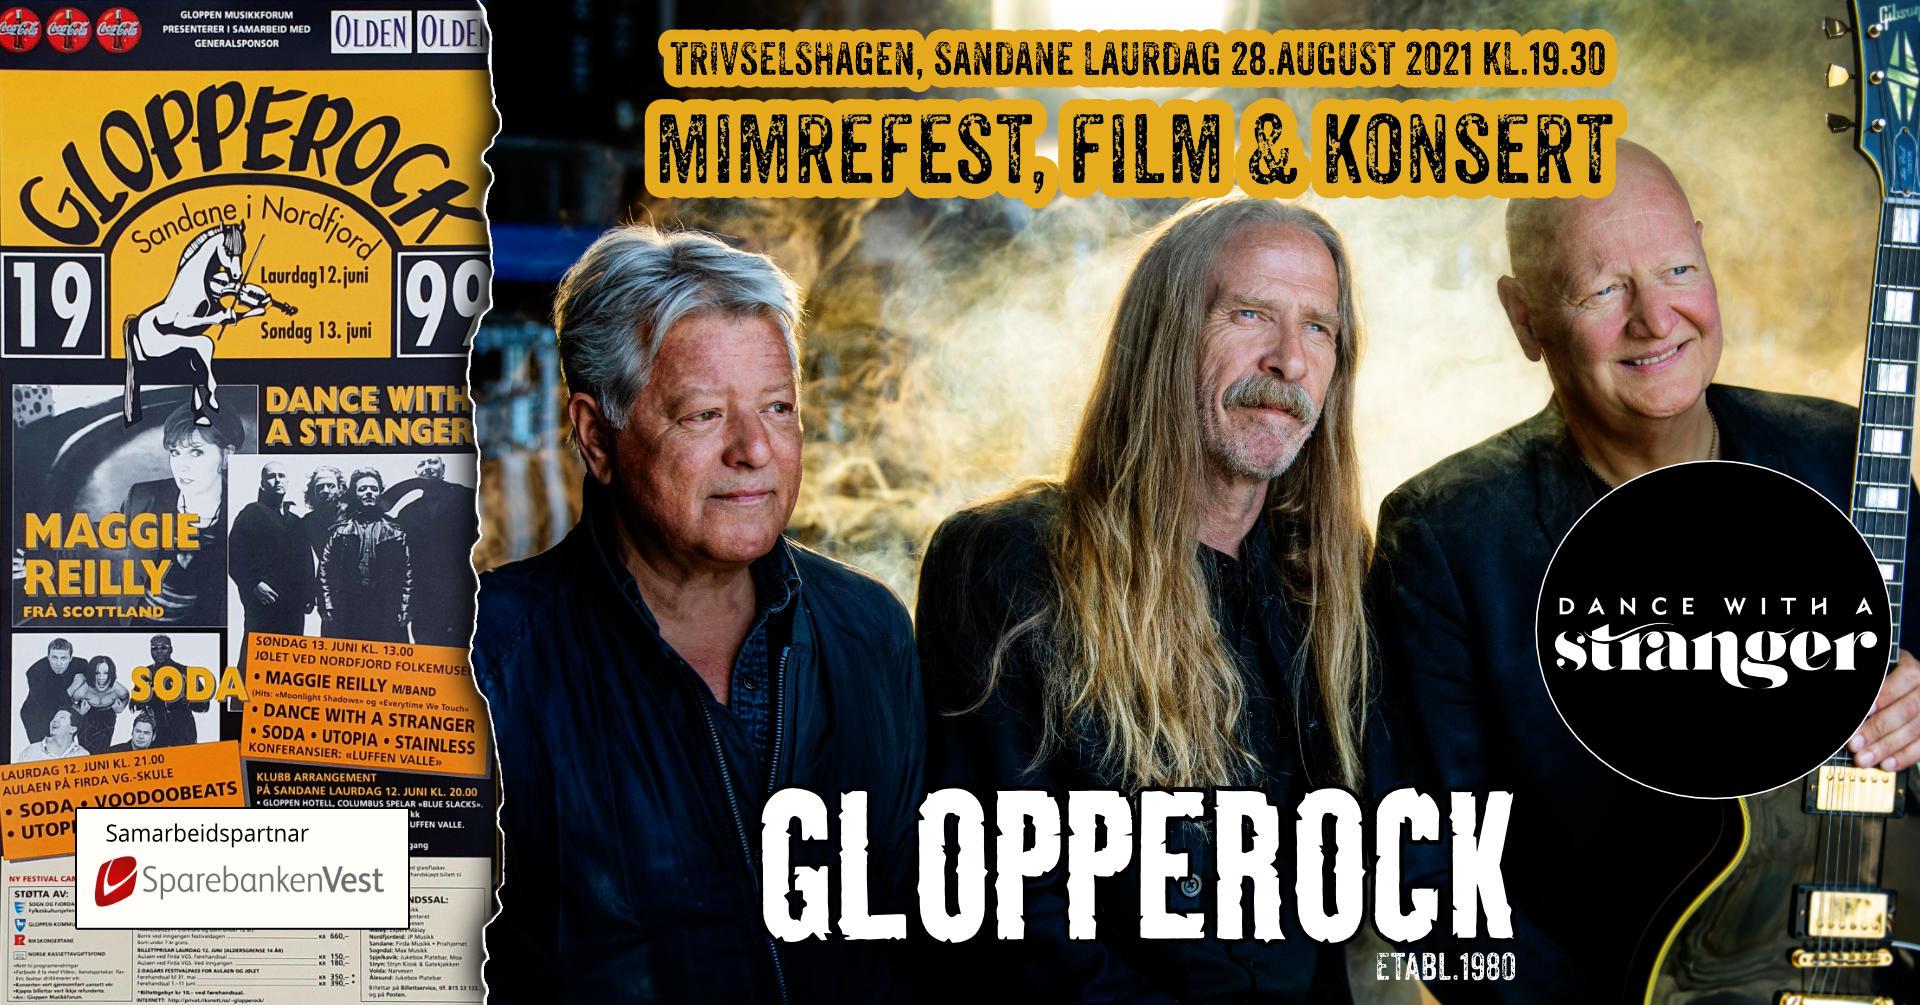 GLOPPEROCK – mimrefest, film & konsert